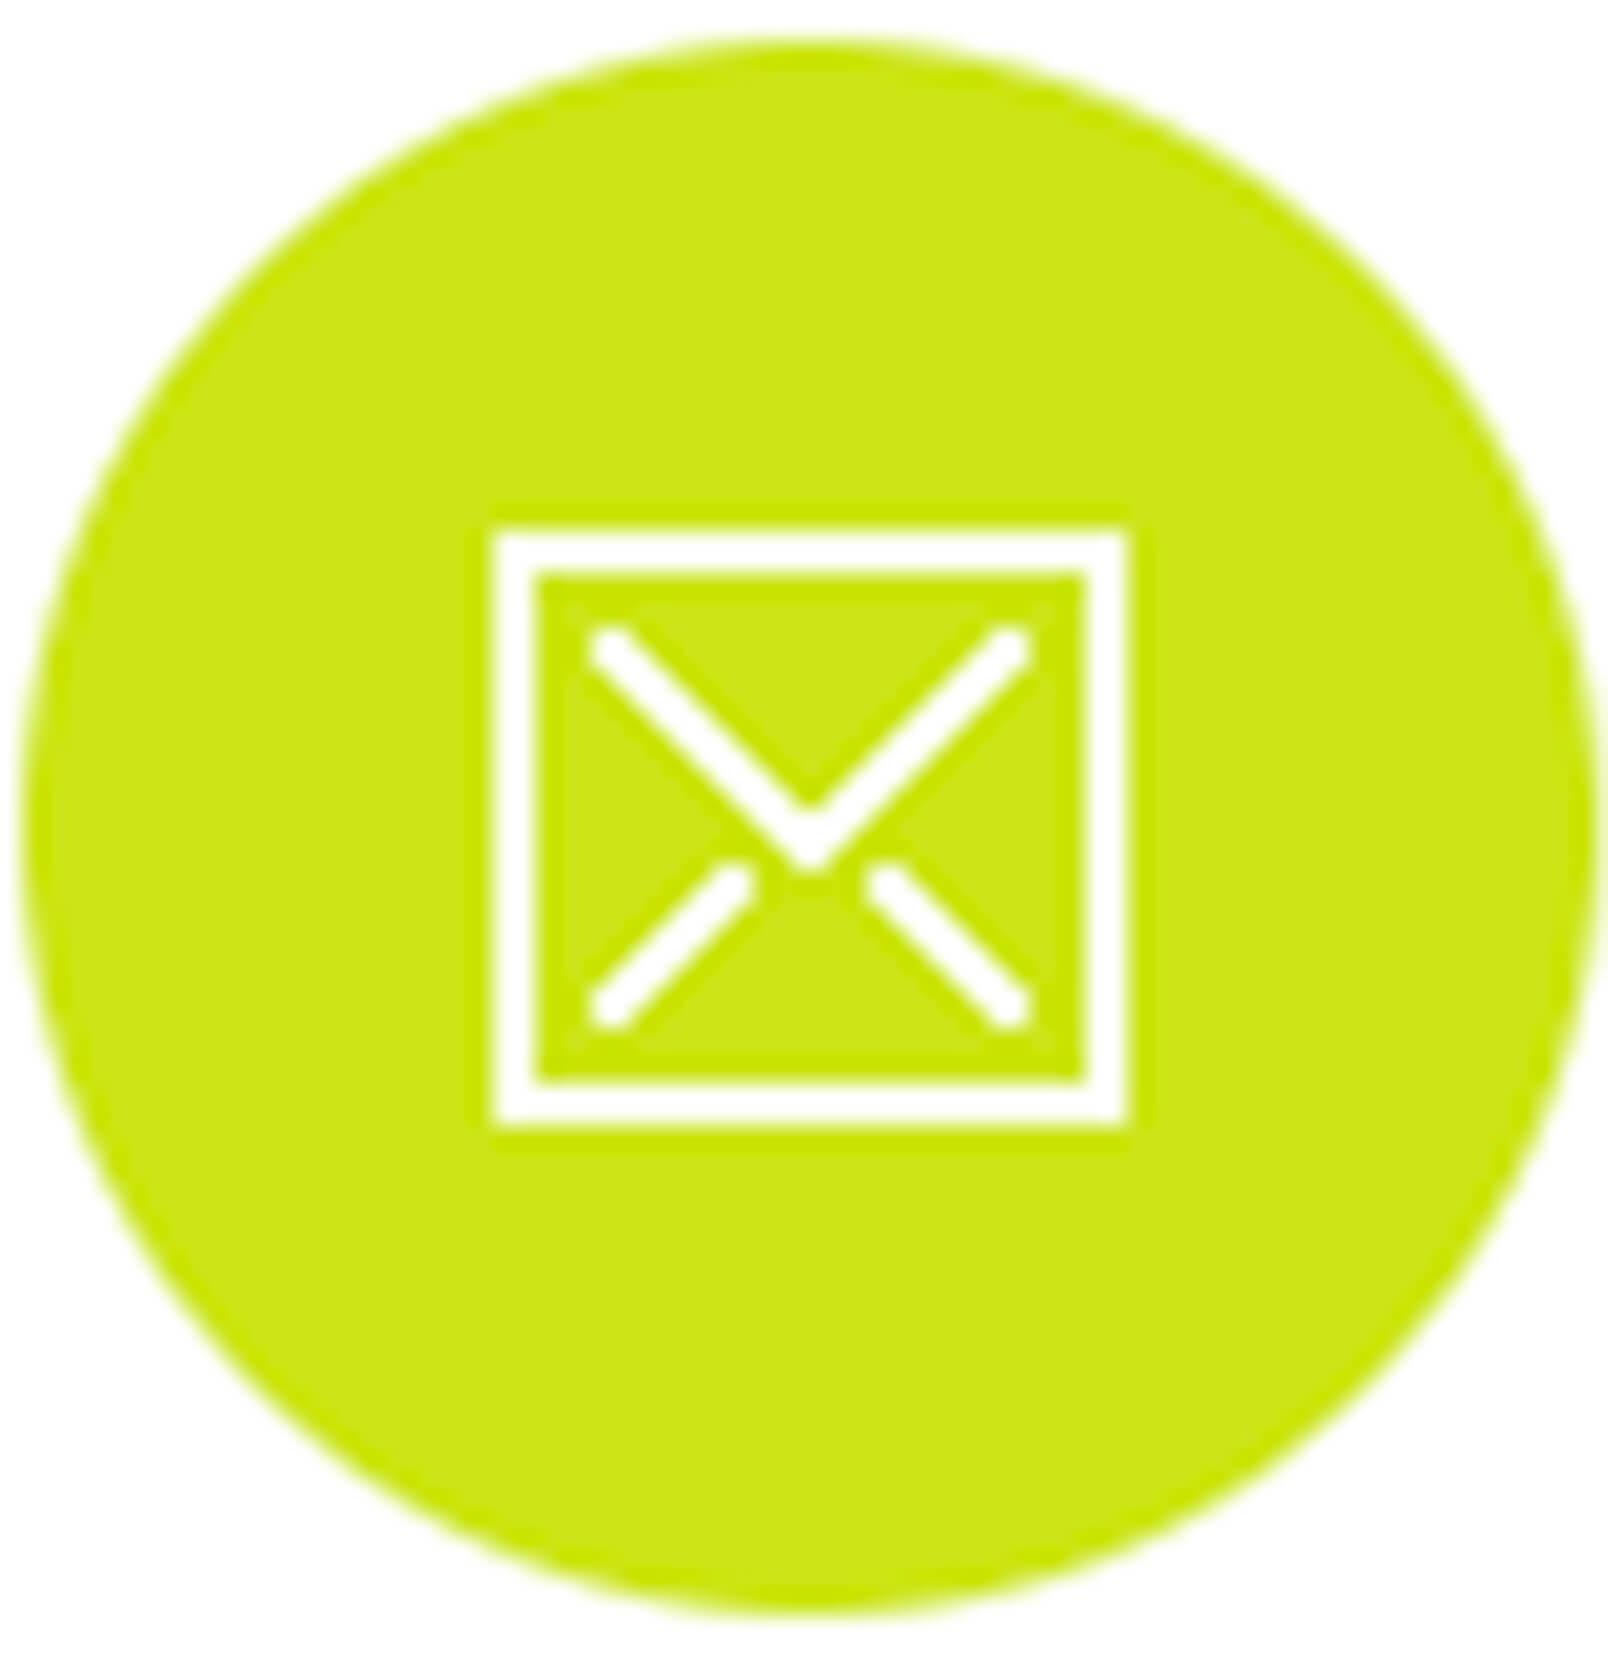 icone-riverside-address